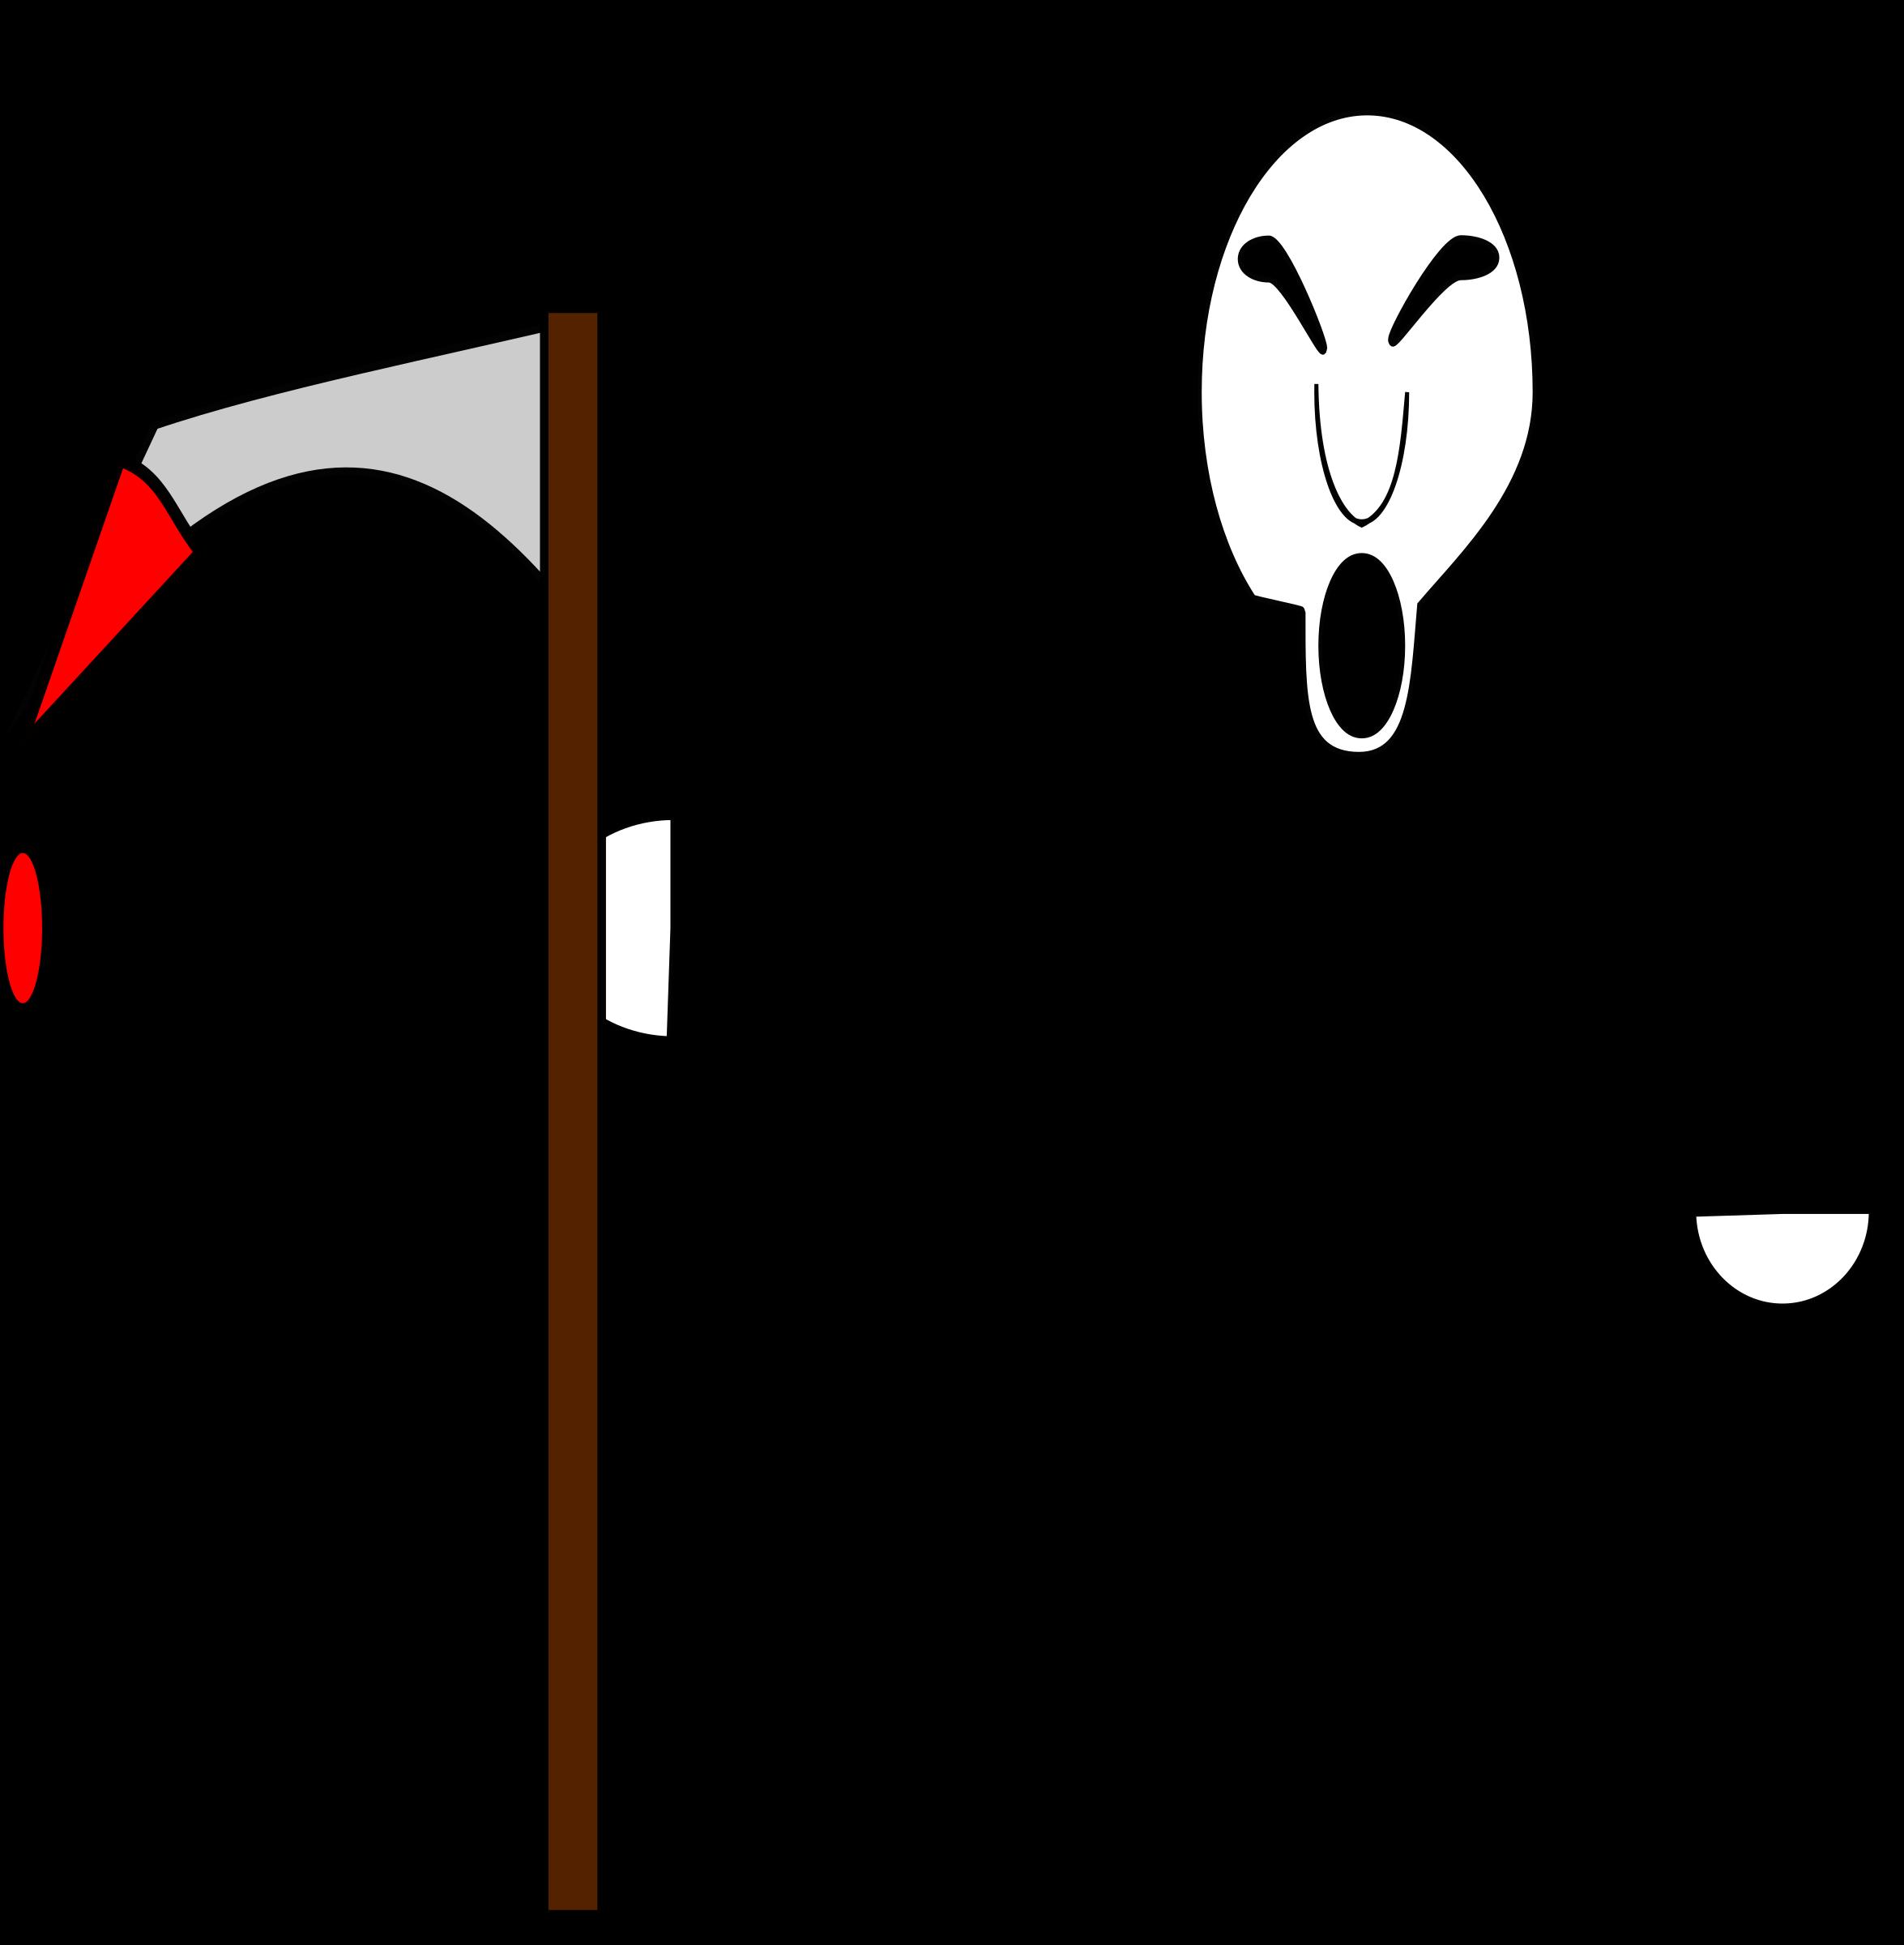 Phanom clipart grim By grim grim reaper Clipart